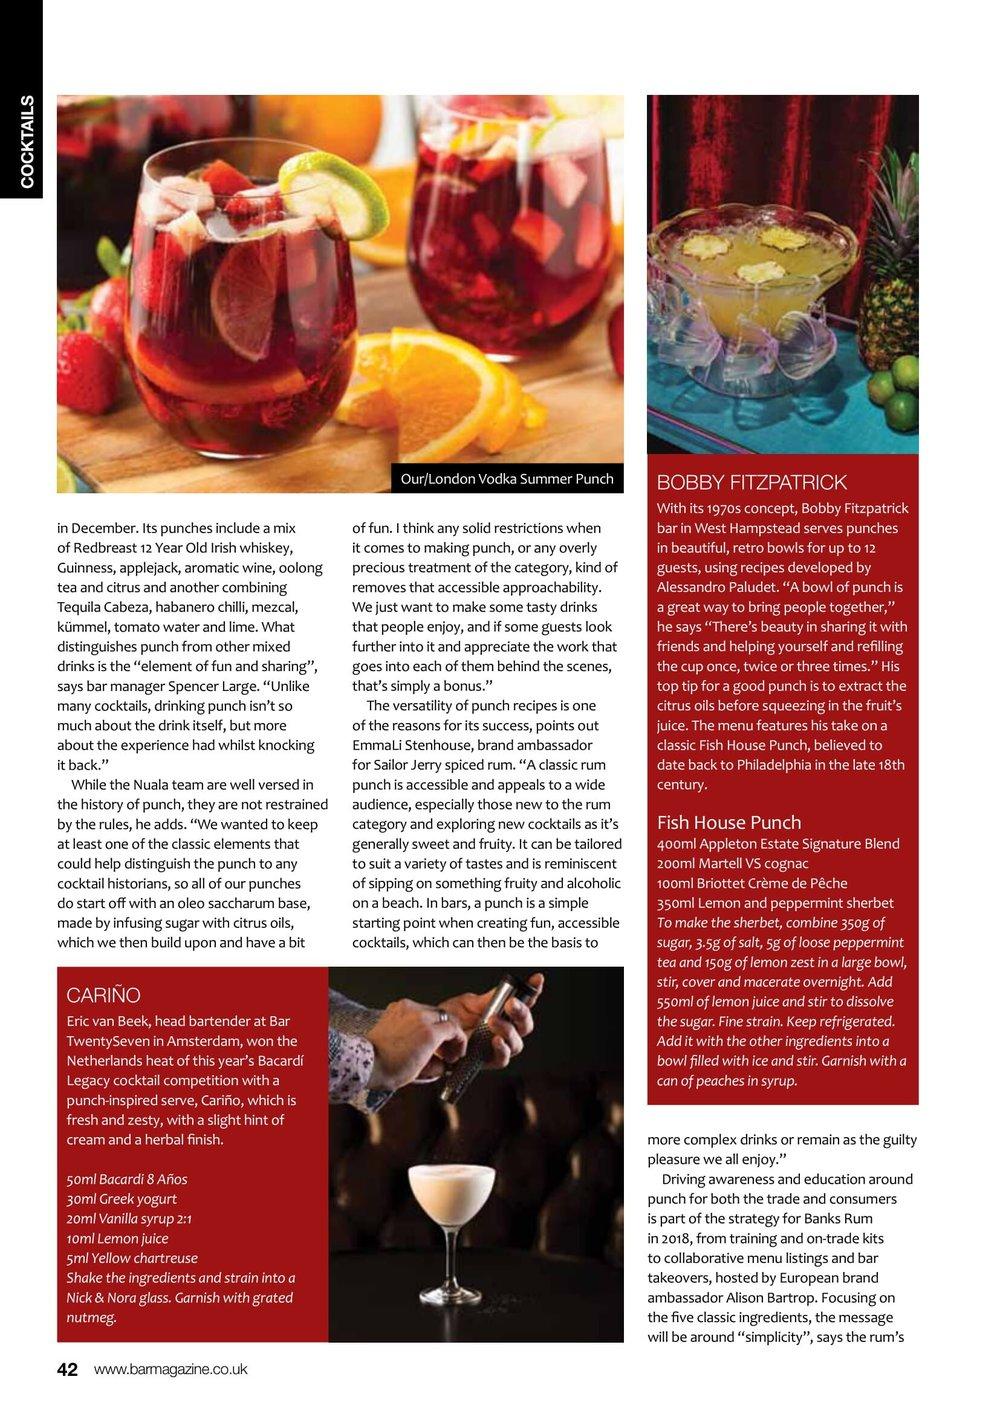 Bar Magazine- Bobby Fitzpatrick.jpeg